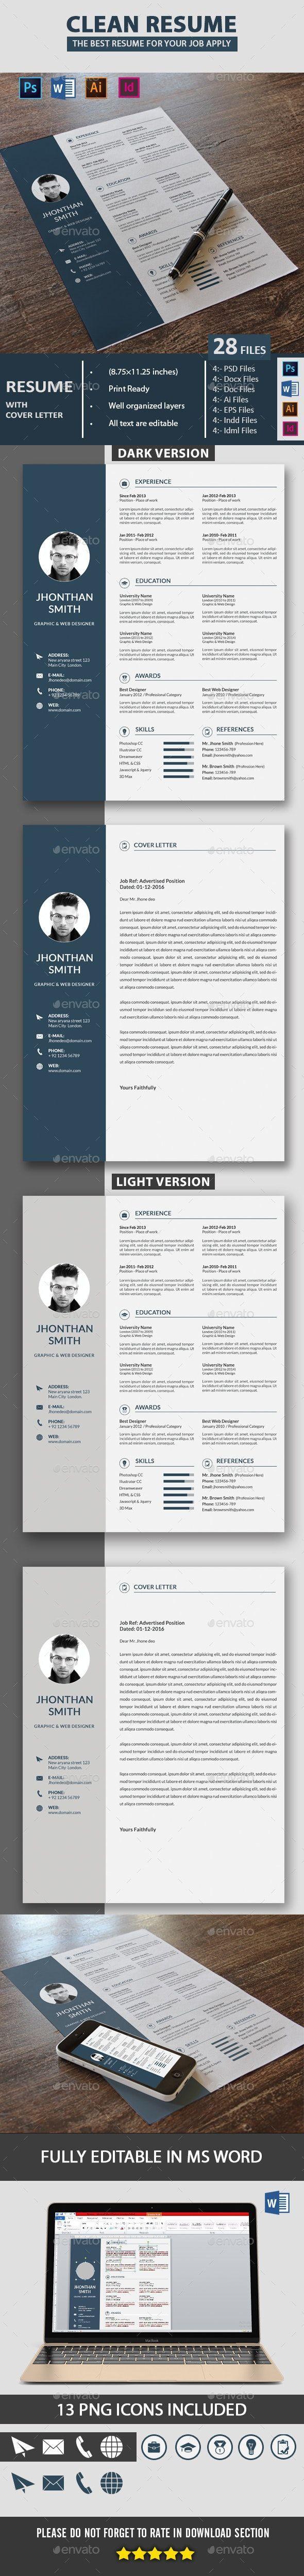 Resume Resume design template, Resume template